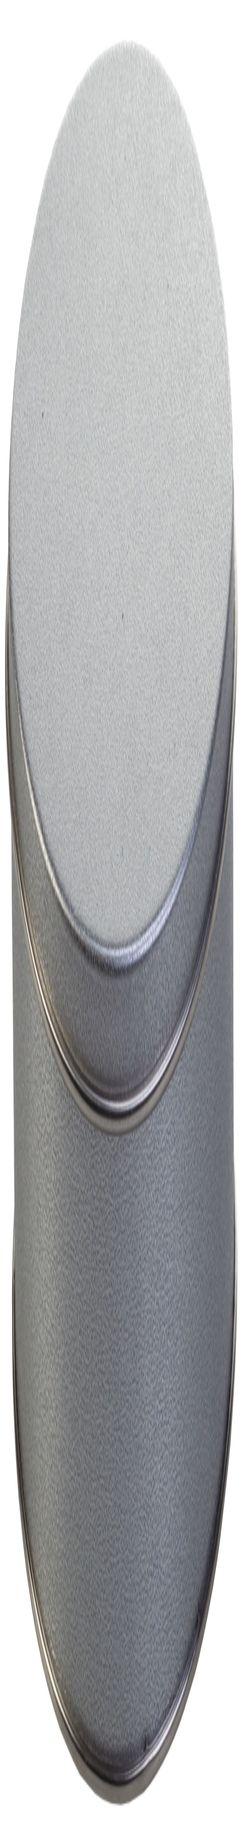 Коробка круглая, малая, серебристая фото